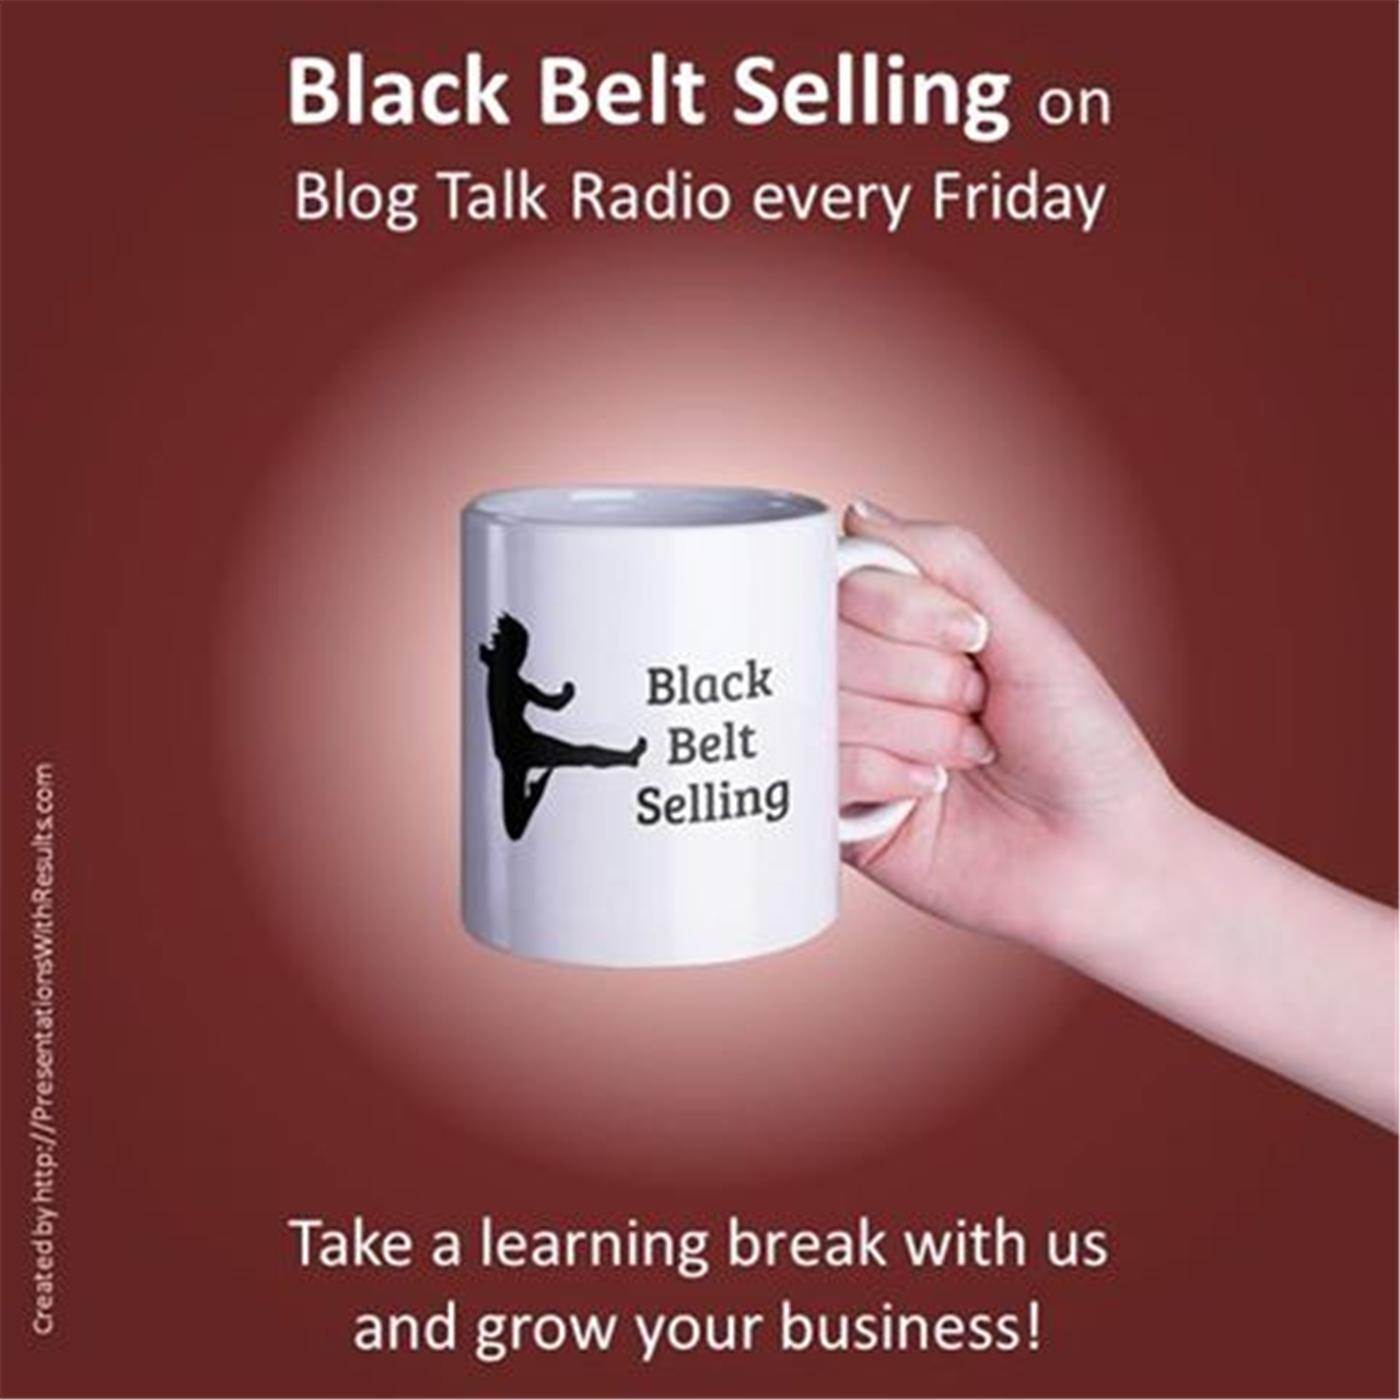 Black Belt Selling